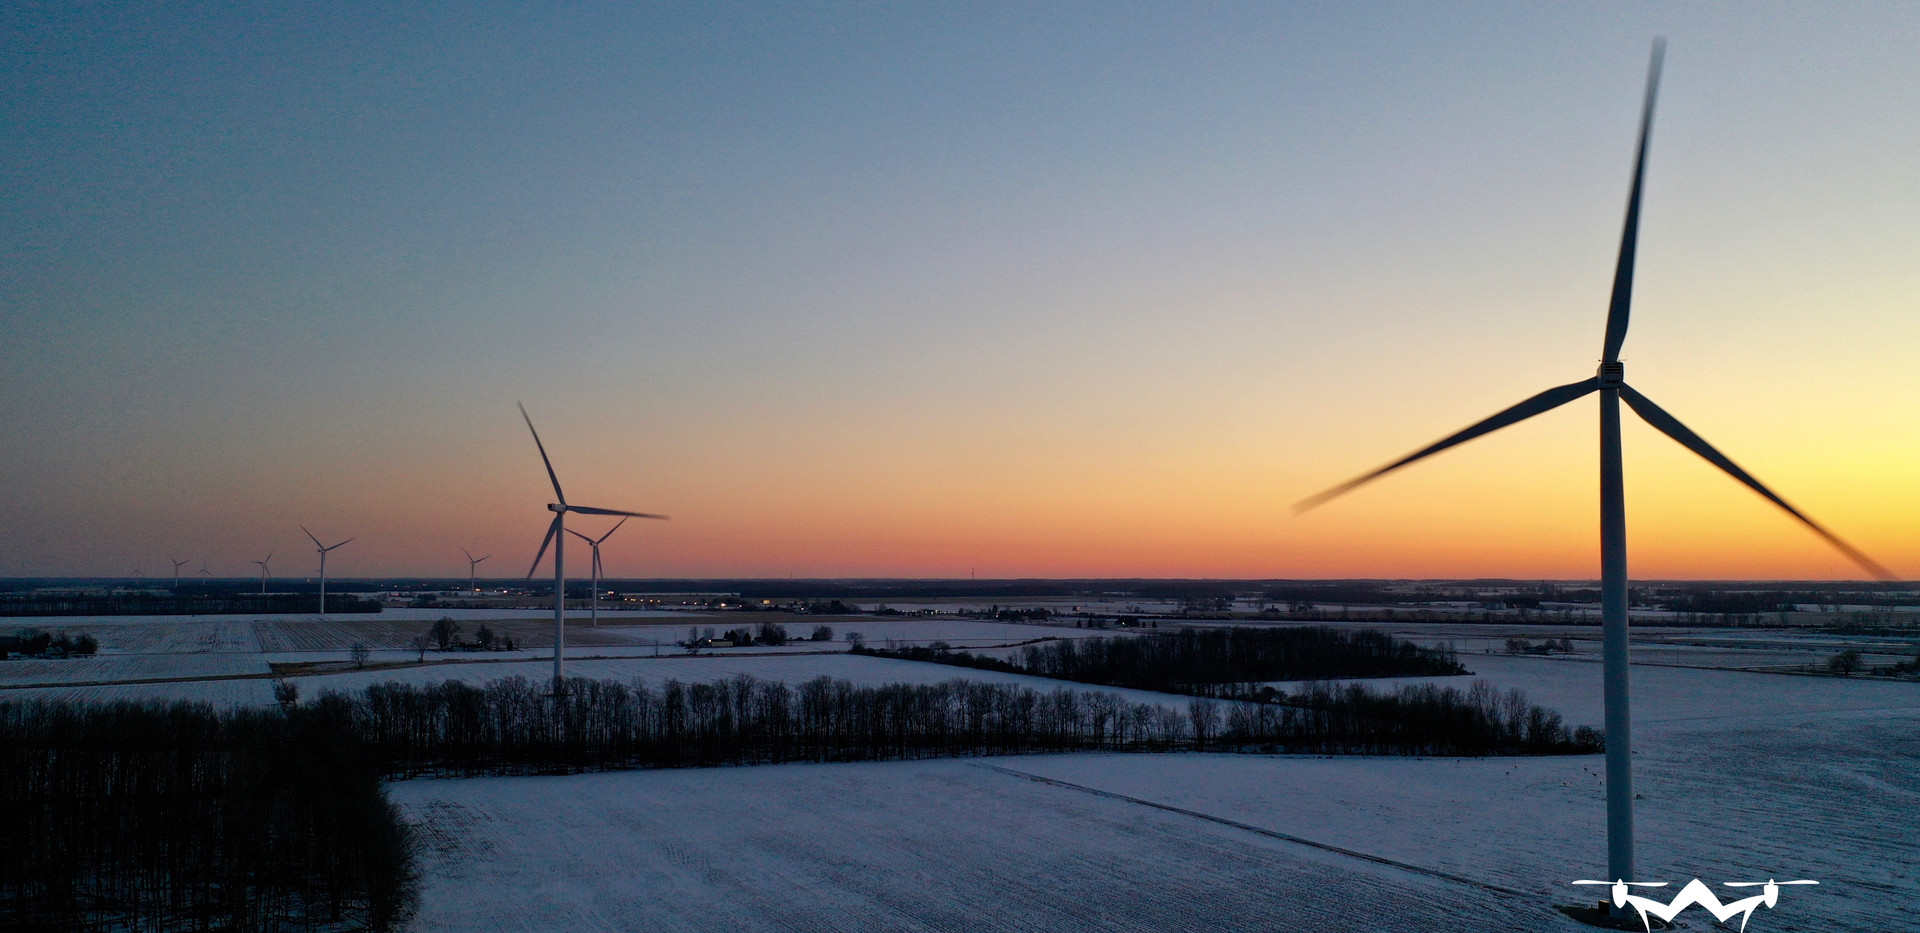 Windmill Farm Drone Patman Droneography